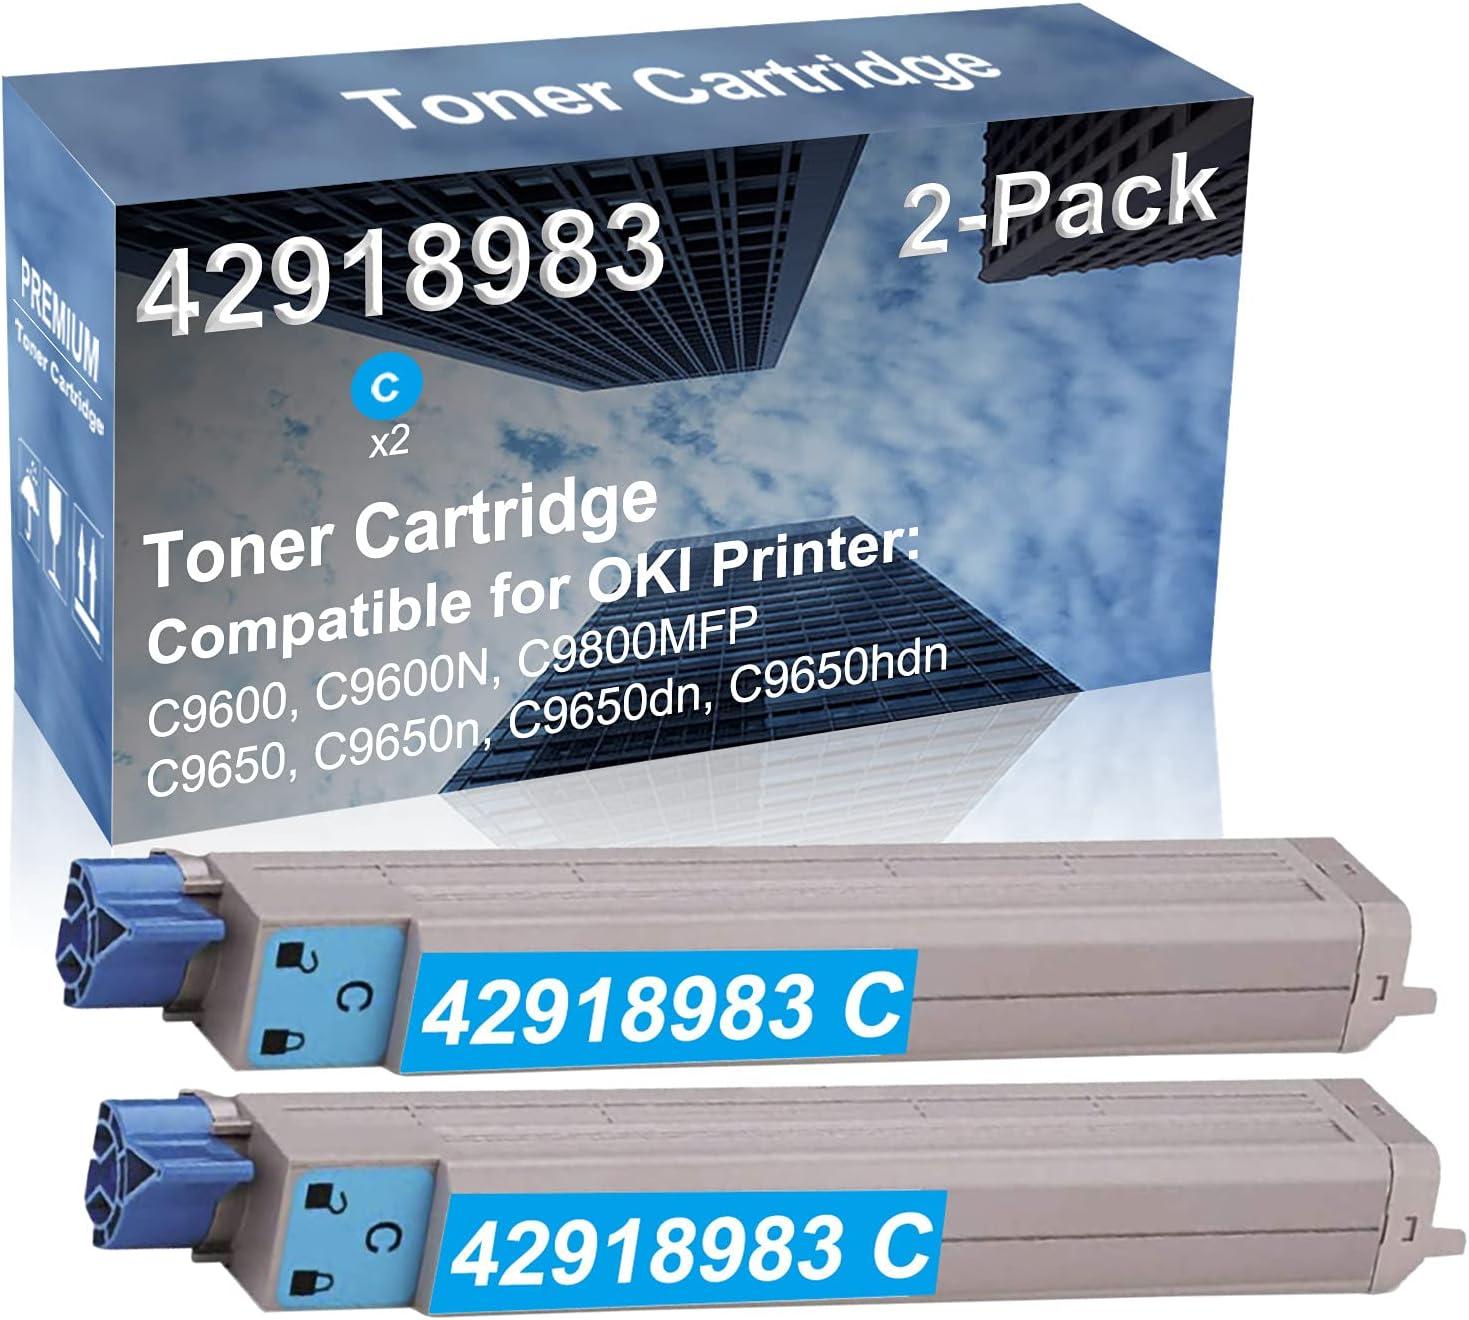 2-Pack (Cyan) Compatible High Yield 42918983 Laser Printer Toner Cartridge Used for OKI Okidata C9650n, C9650dn, C9650hdn Printer